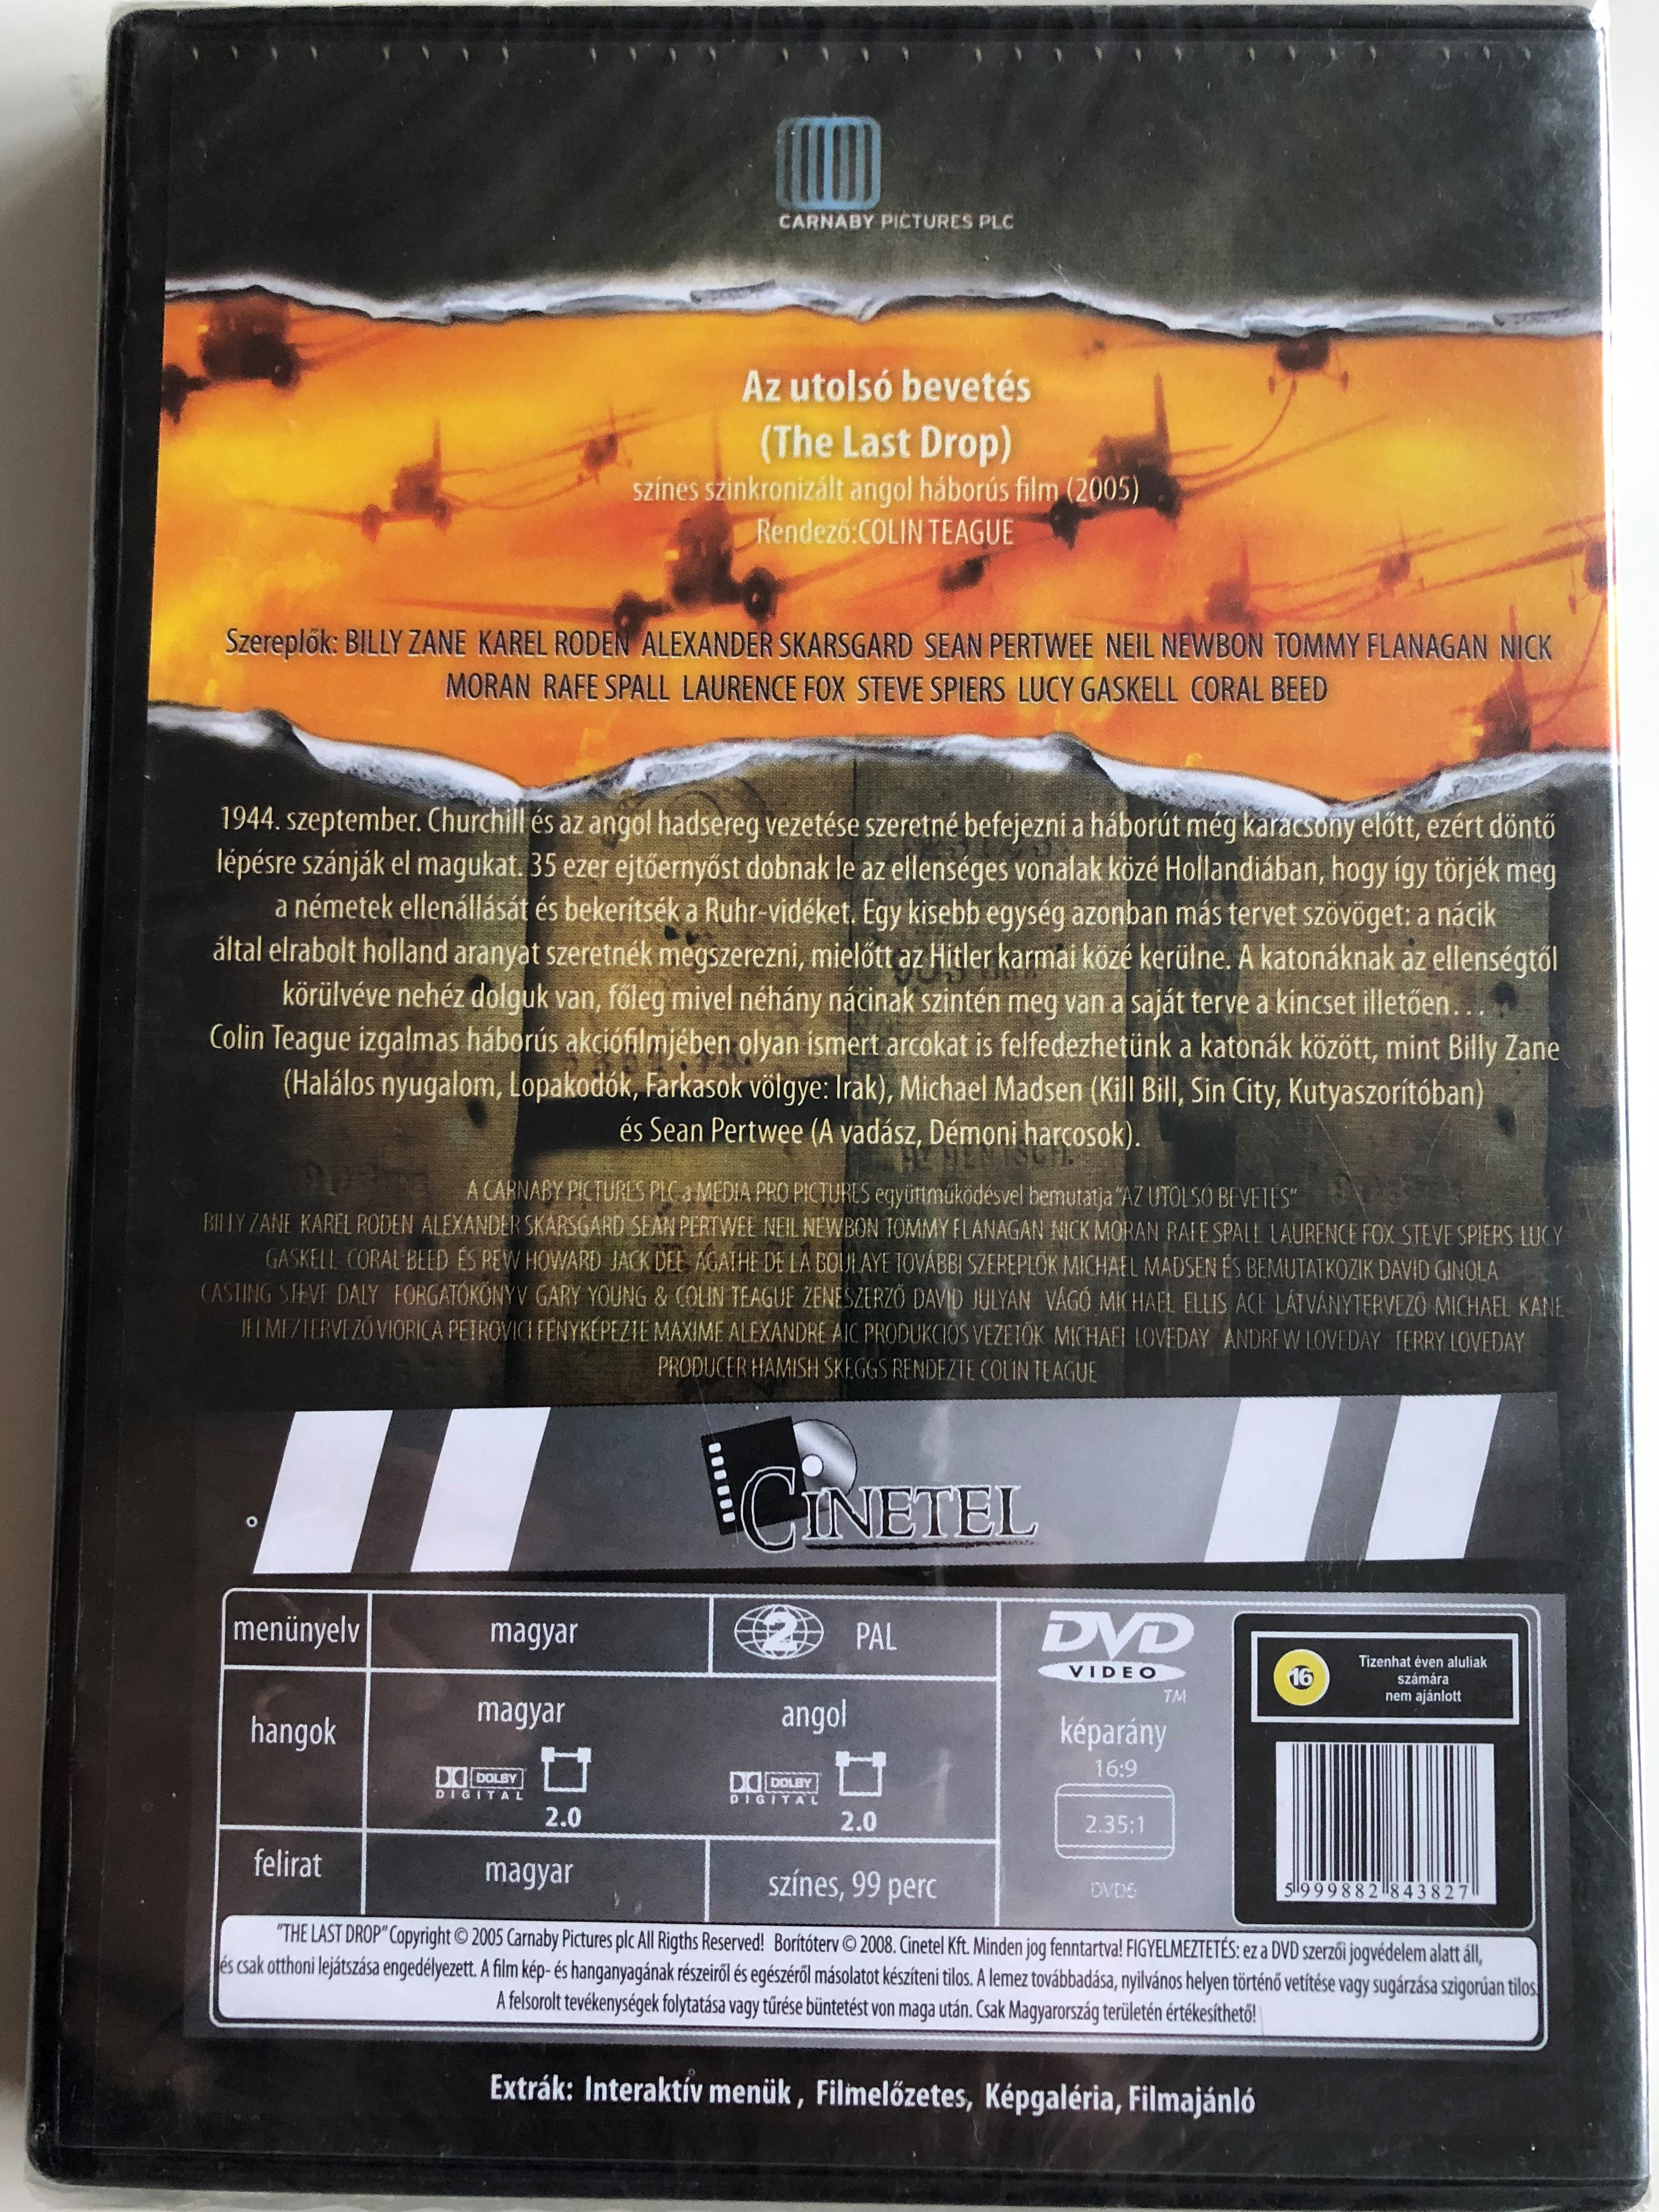 the-last-drop-dvd-az-utols-bevet-s-directed-by-colin-teague-2.jpg